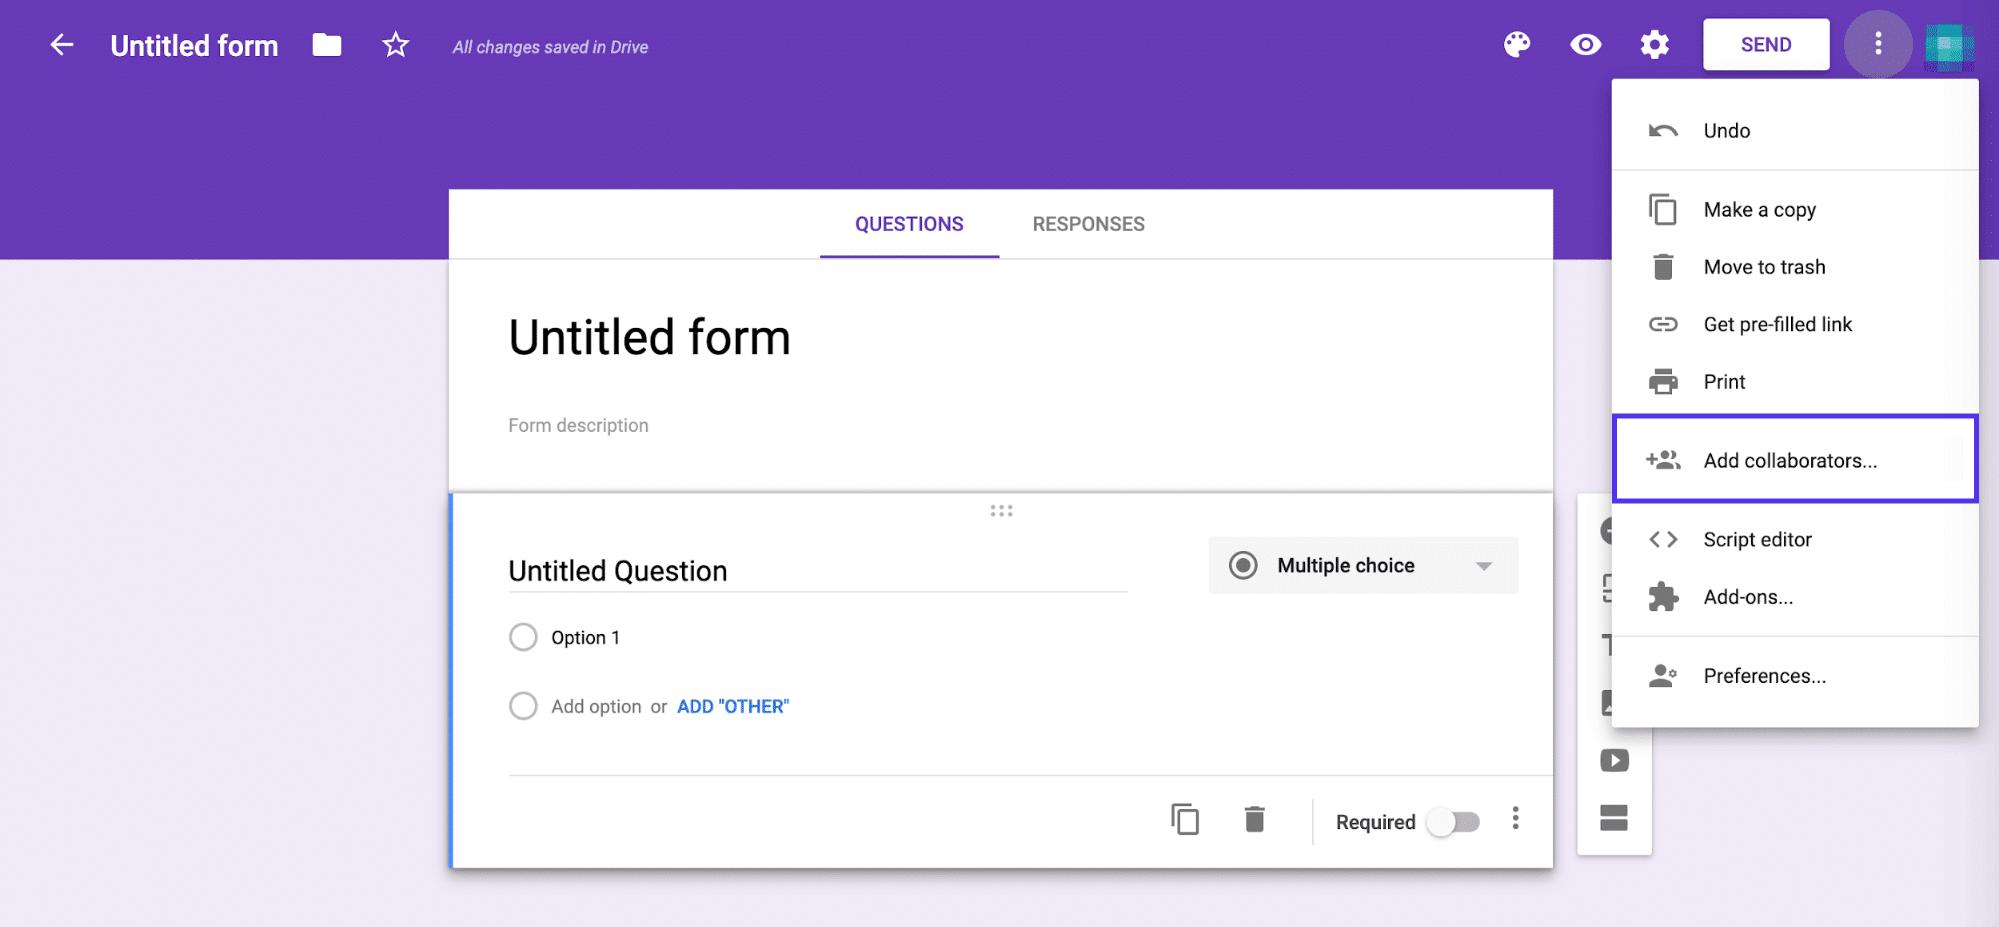 Aggiungere collaboratori a Google Forms